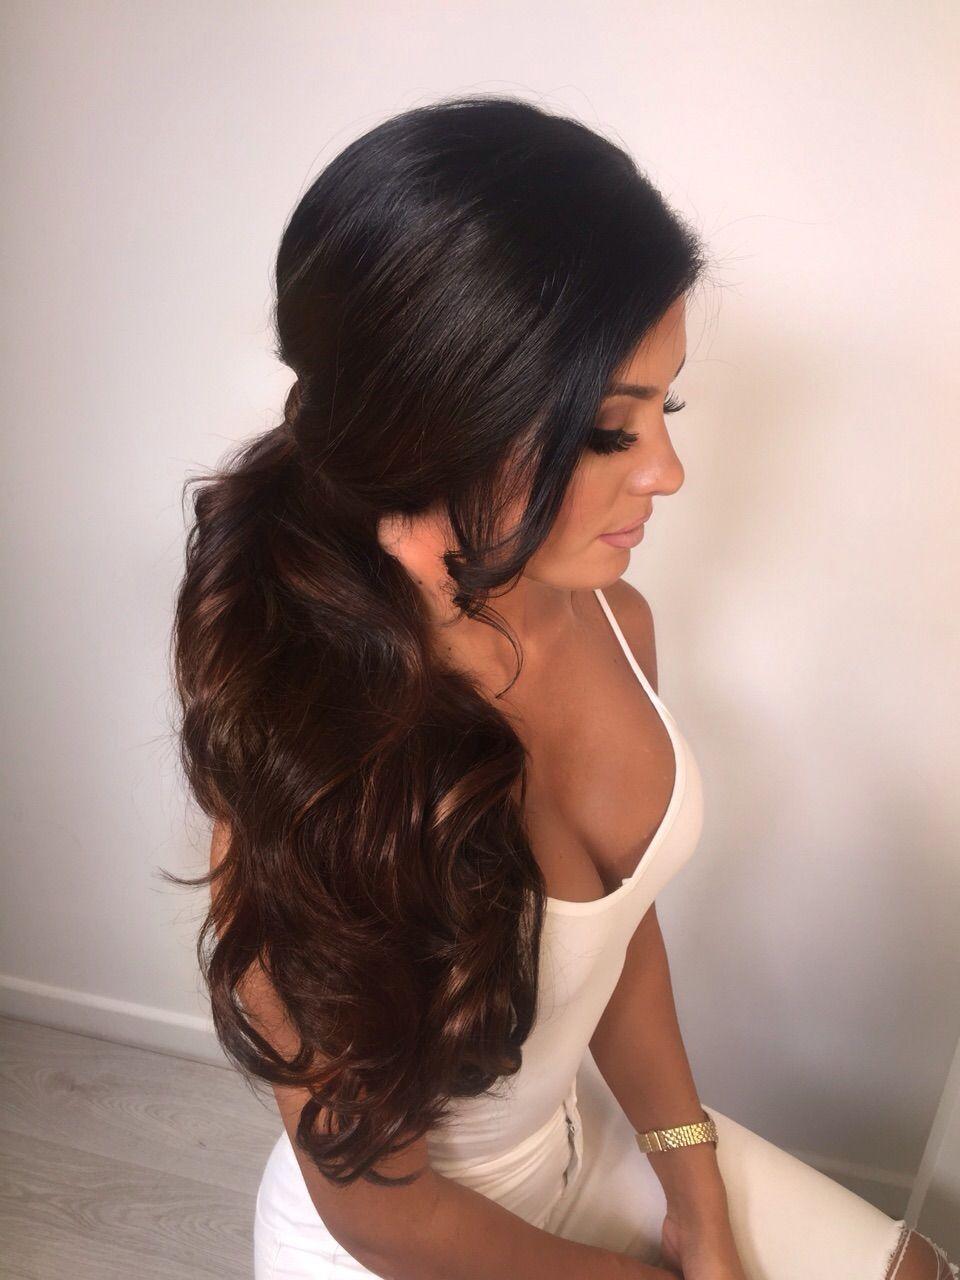 Pin by jessica stellato on bridesmaid hair pinterest hair style